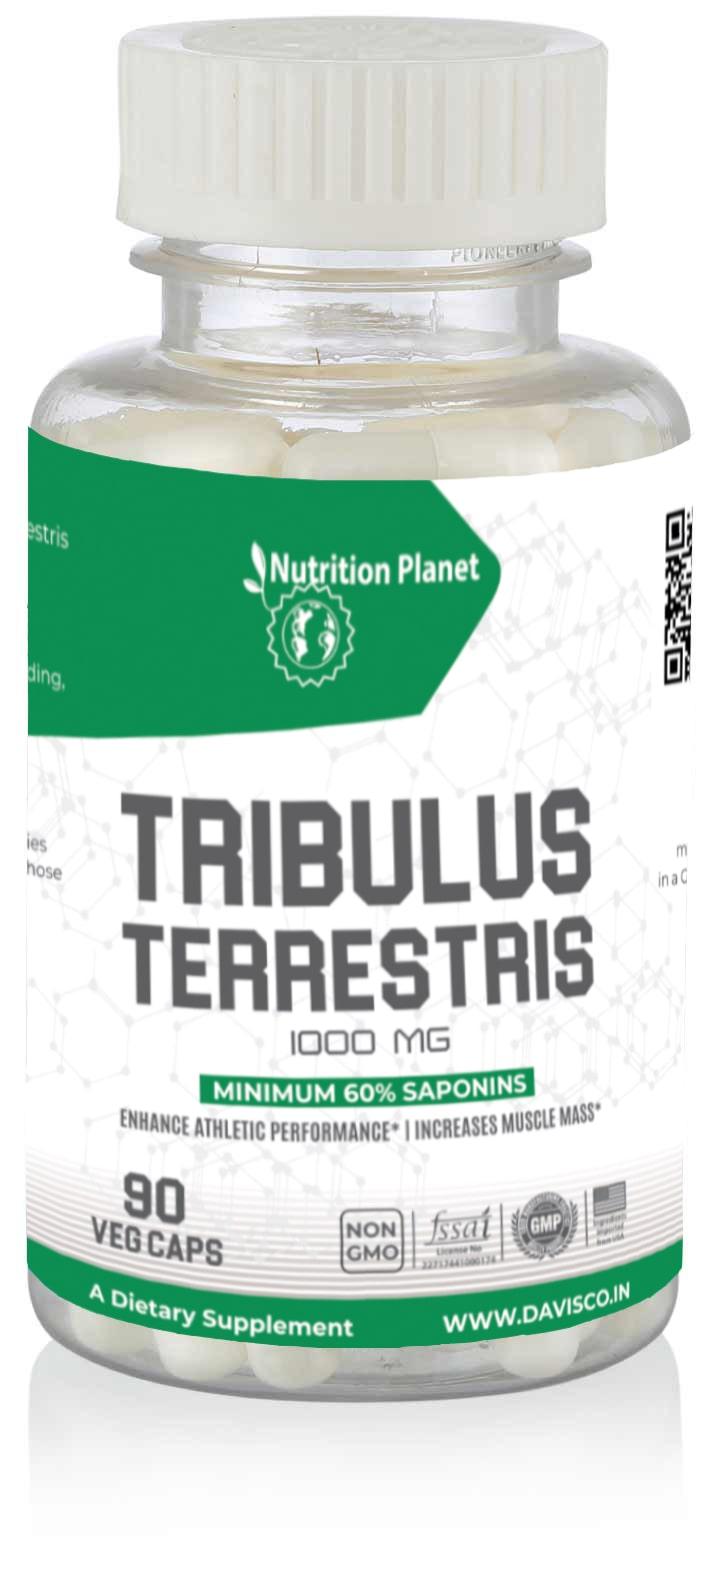 Tribulus Terrestris - Min. 60% Saponins